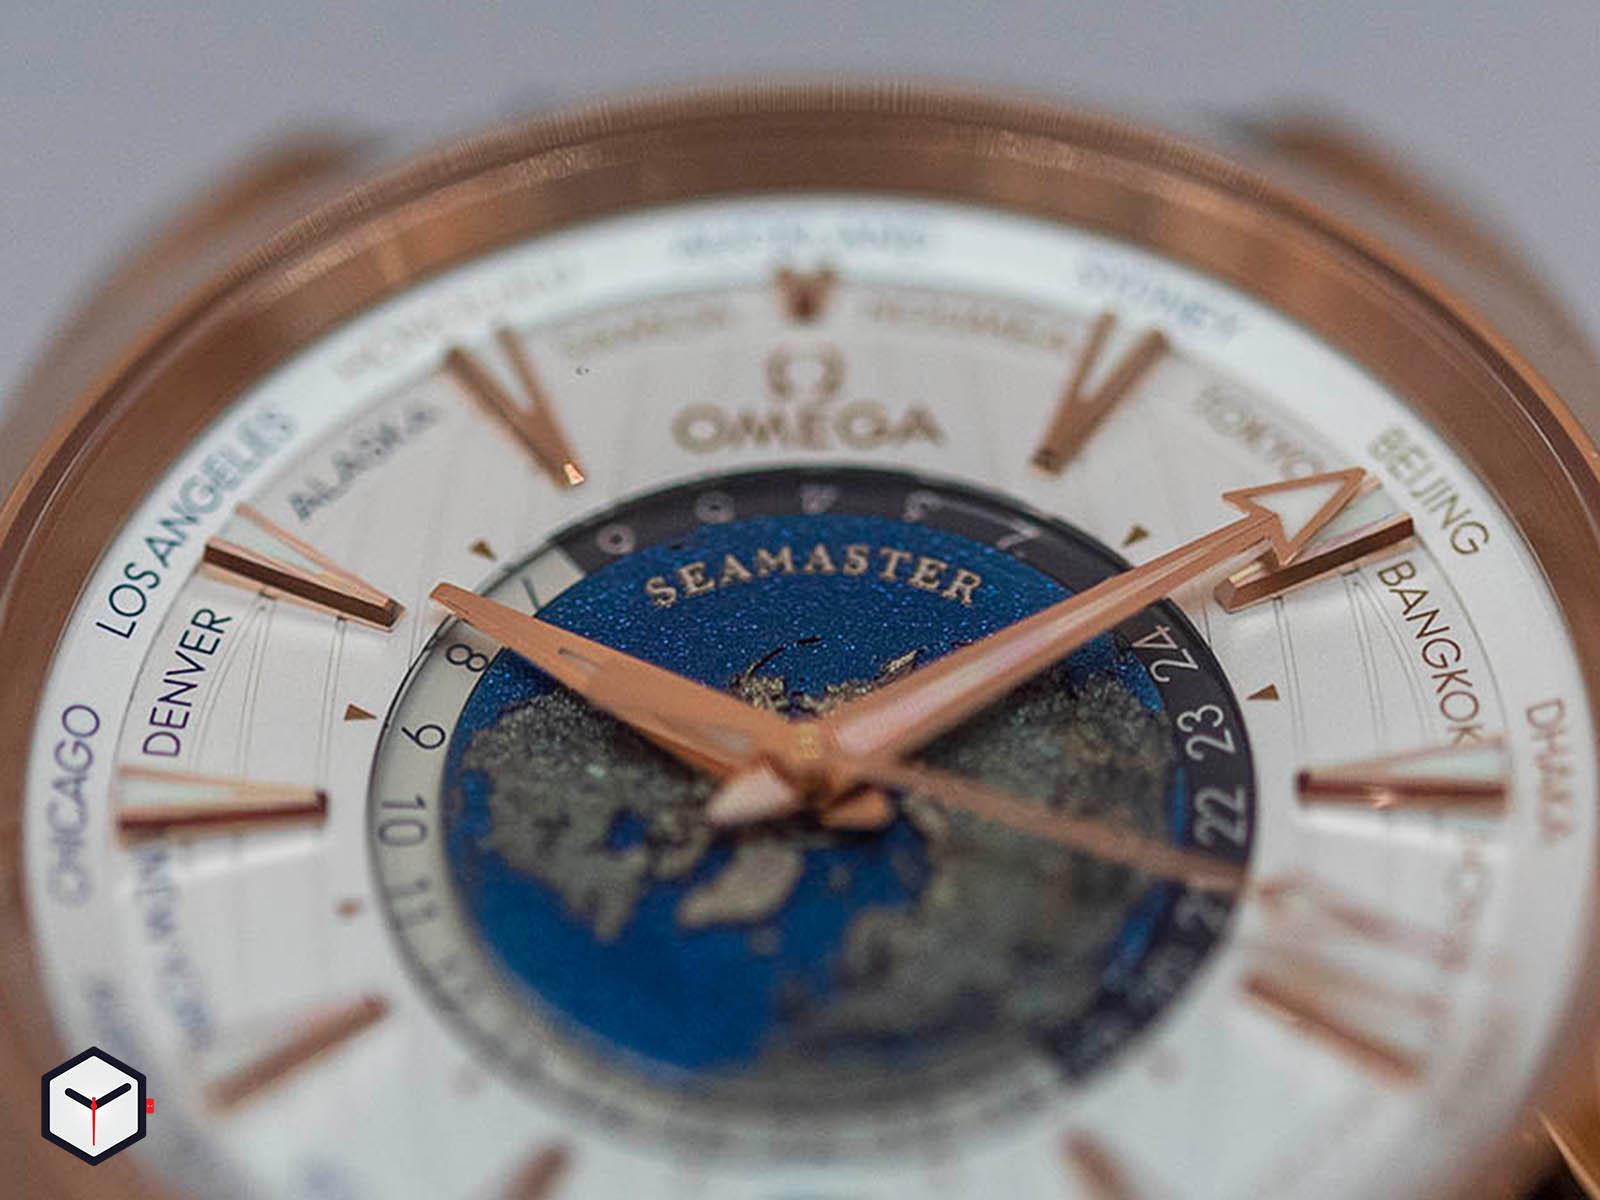 220-53-43-22-02-001-omega-seamaster-aqua-terra-150m-gmt-worldtimer-9.jpg